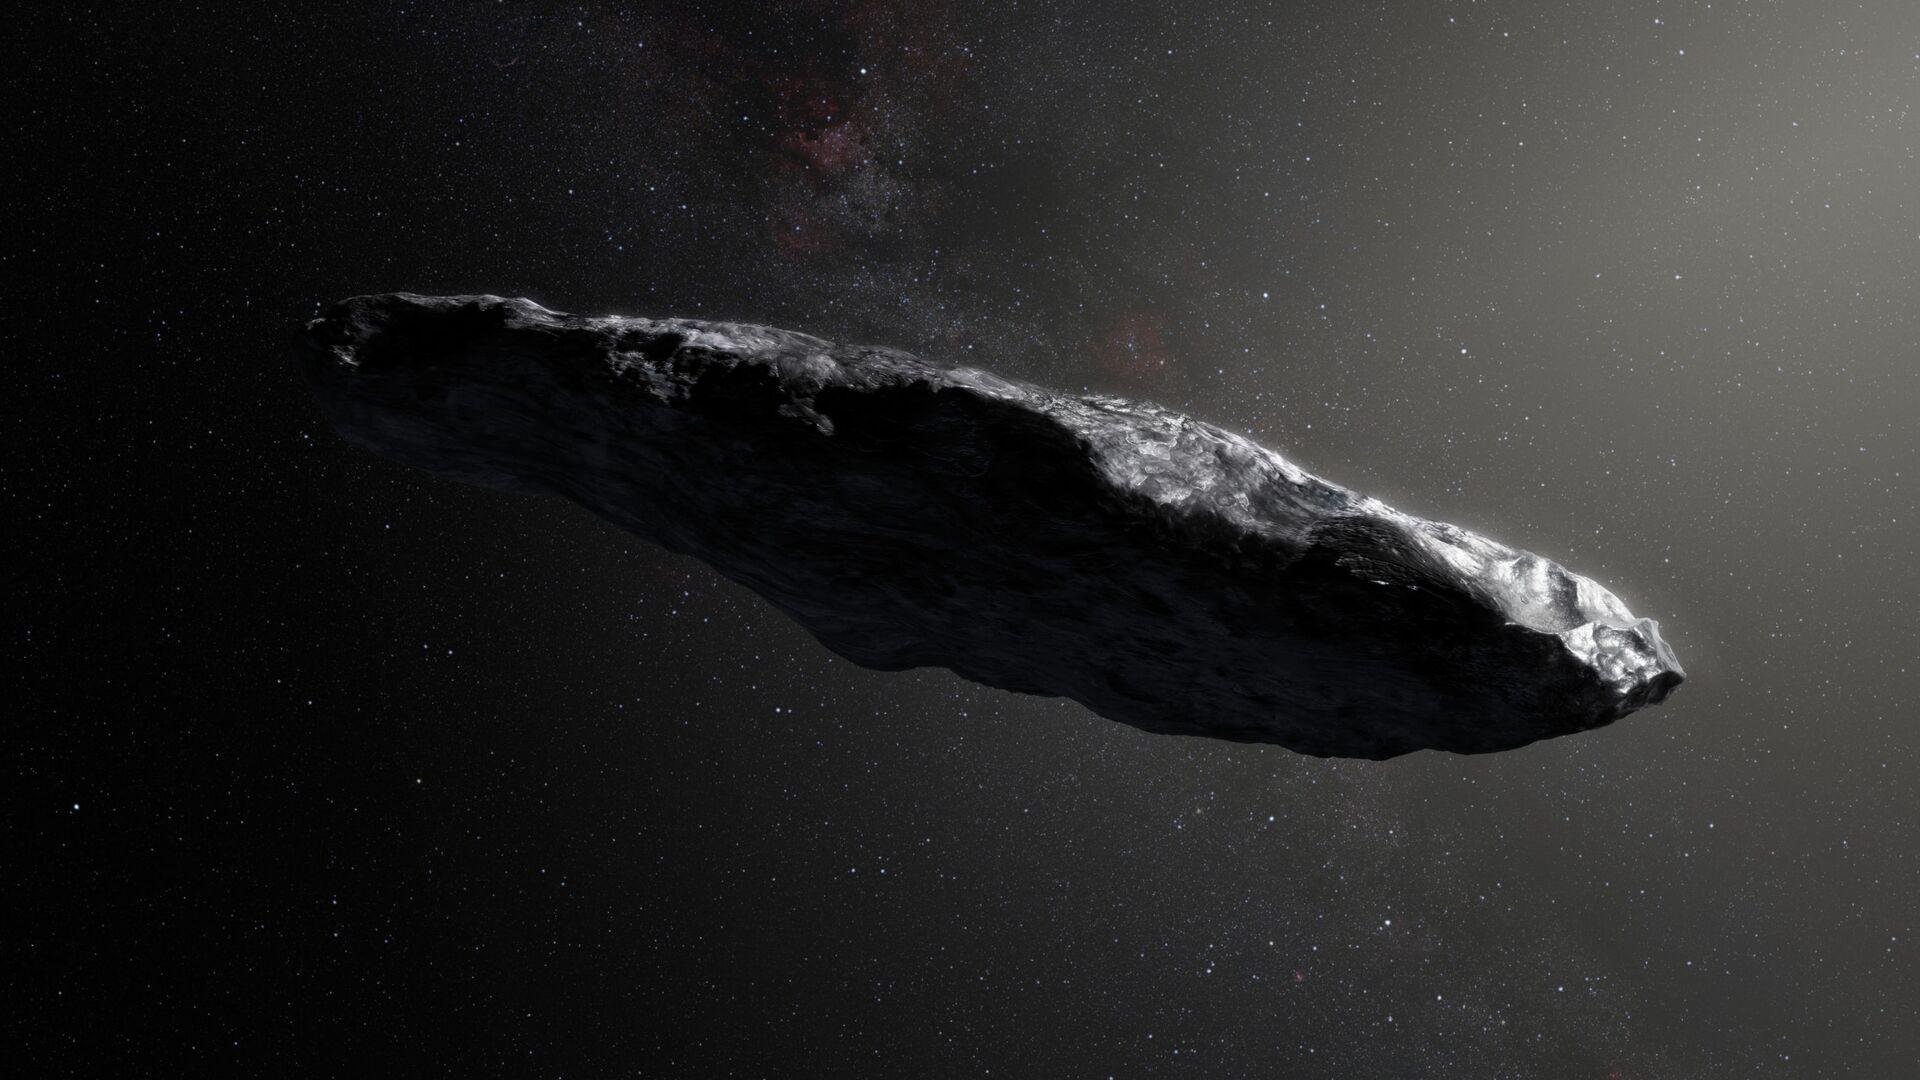 Ilustracja planetoidy Oumuamua - Sputnik Polska, 1920, 19.03.2021